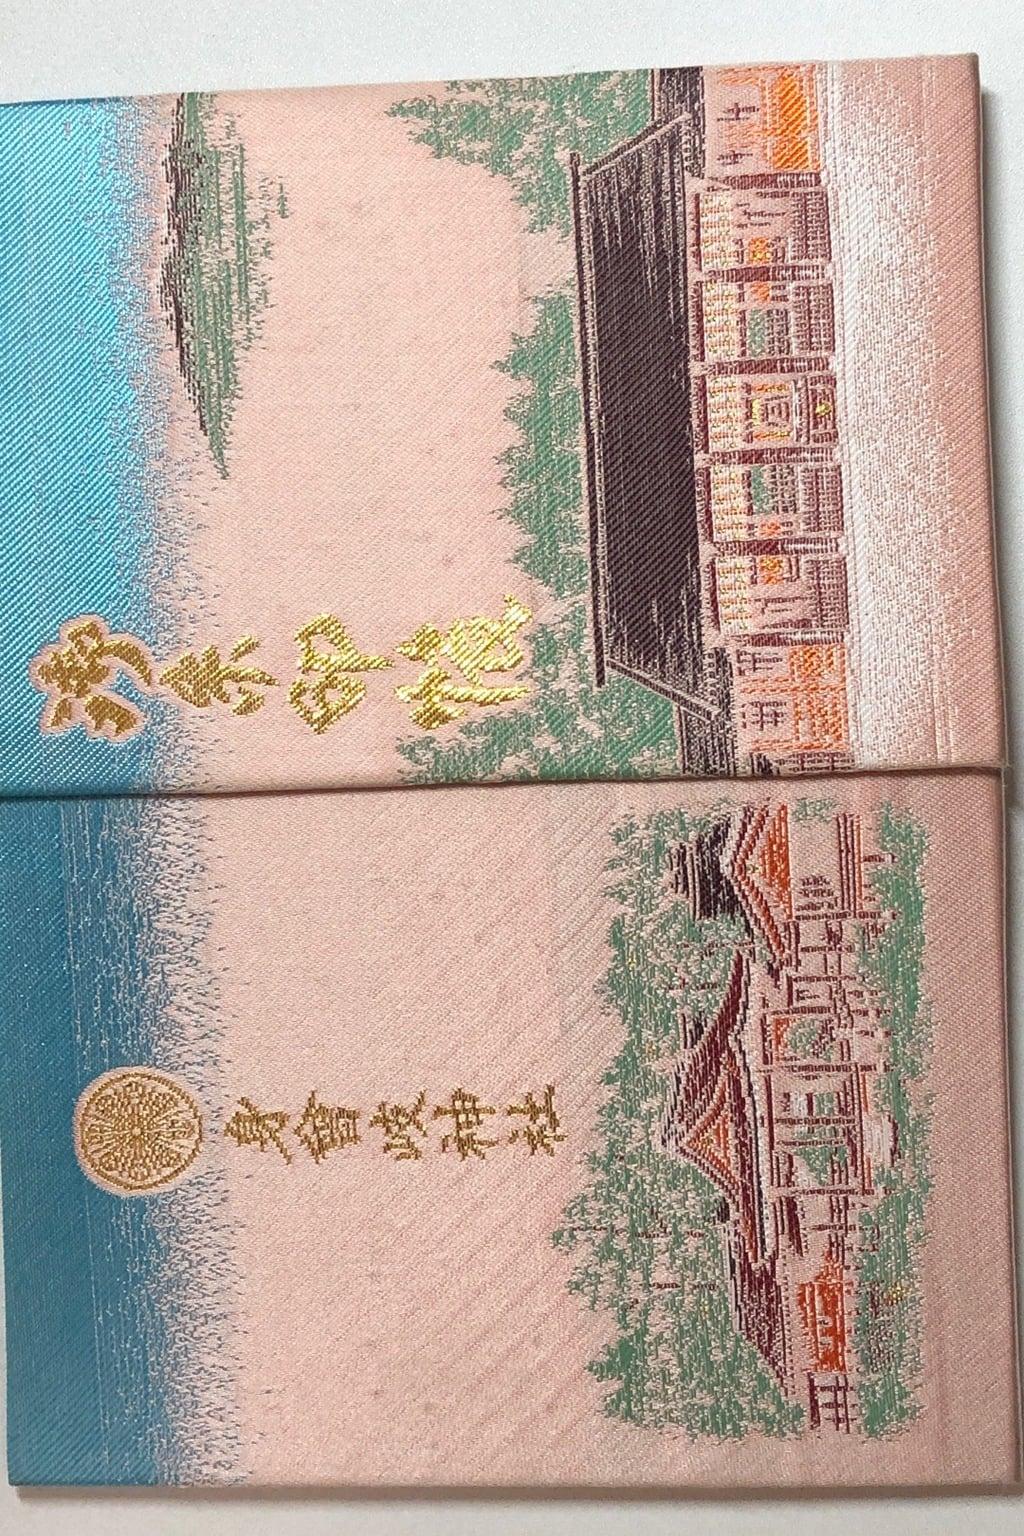 身曾岐神社の御朱印帳